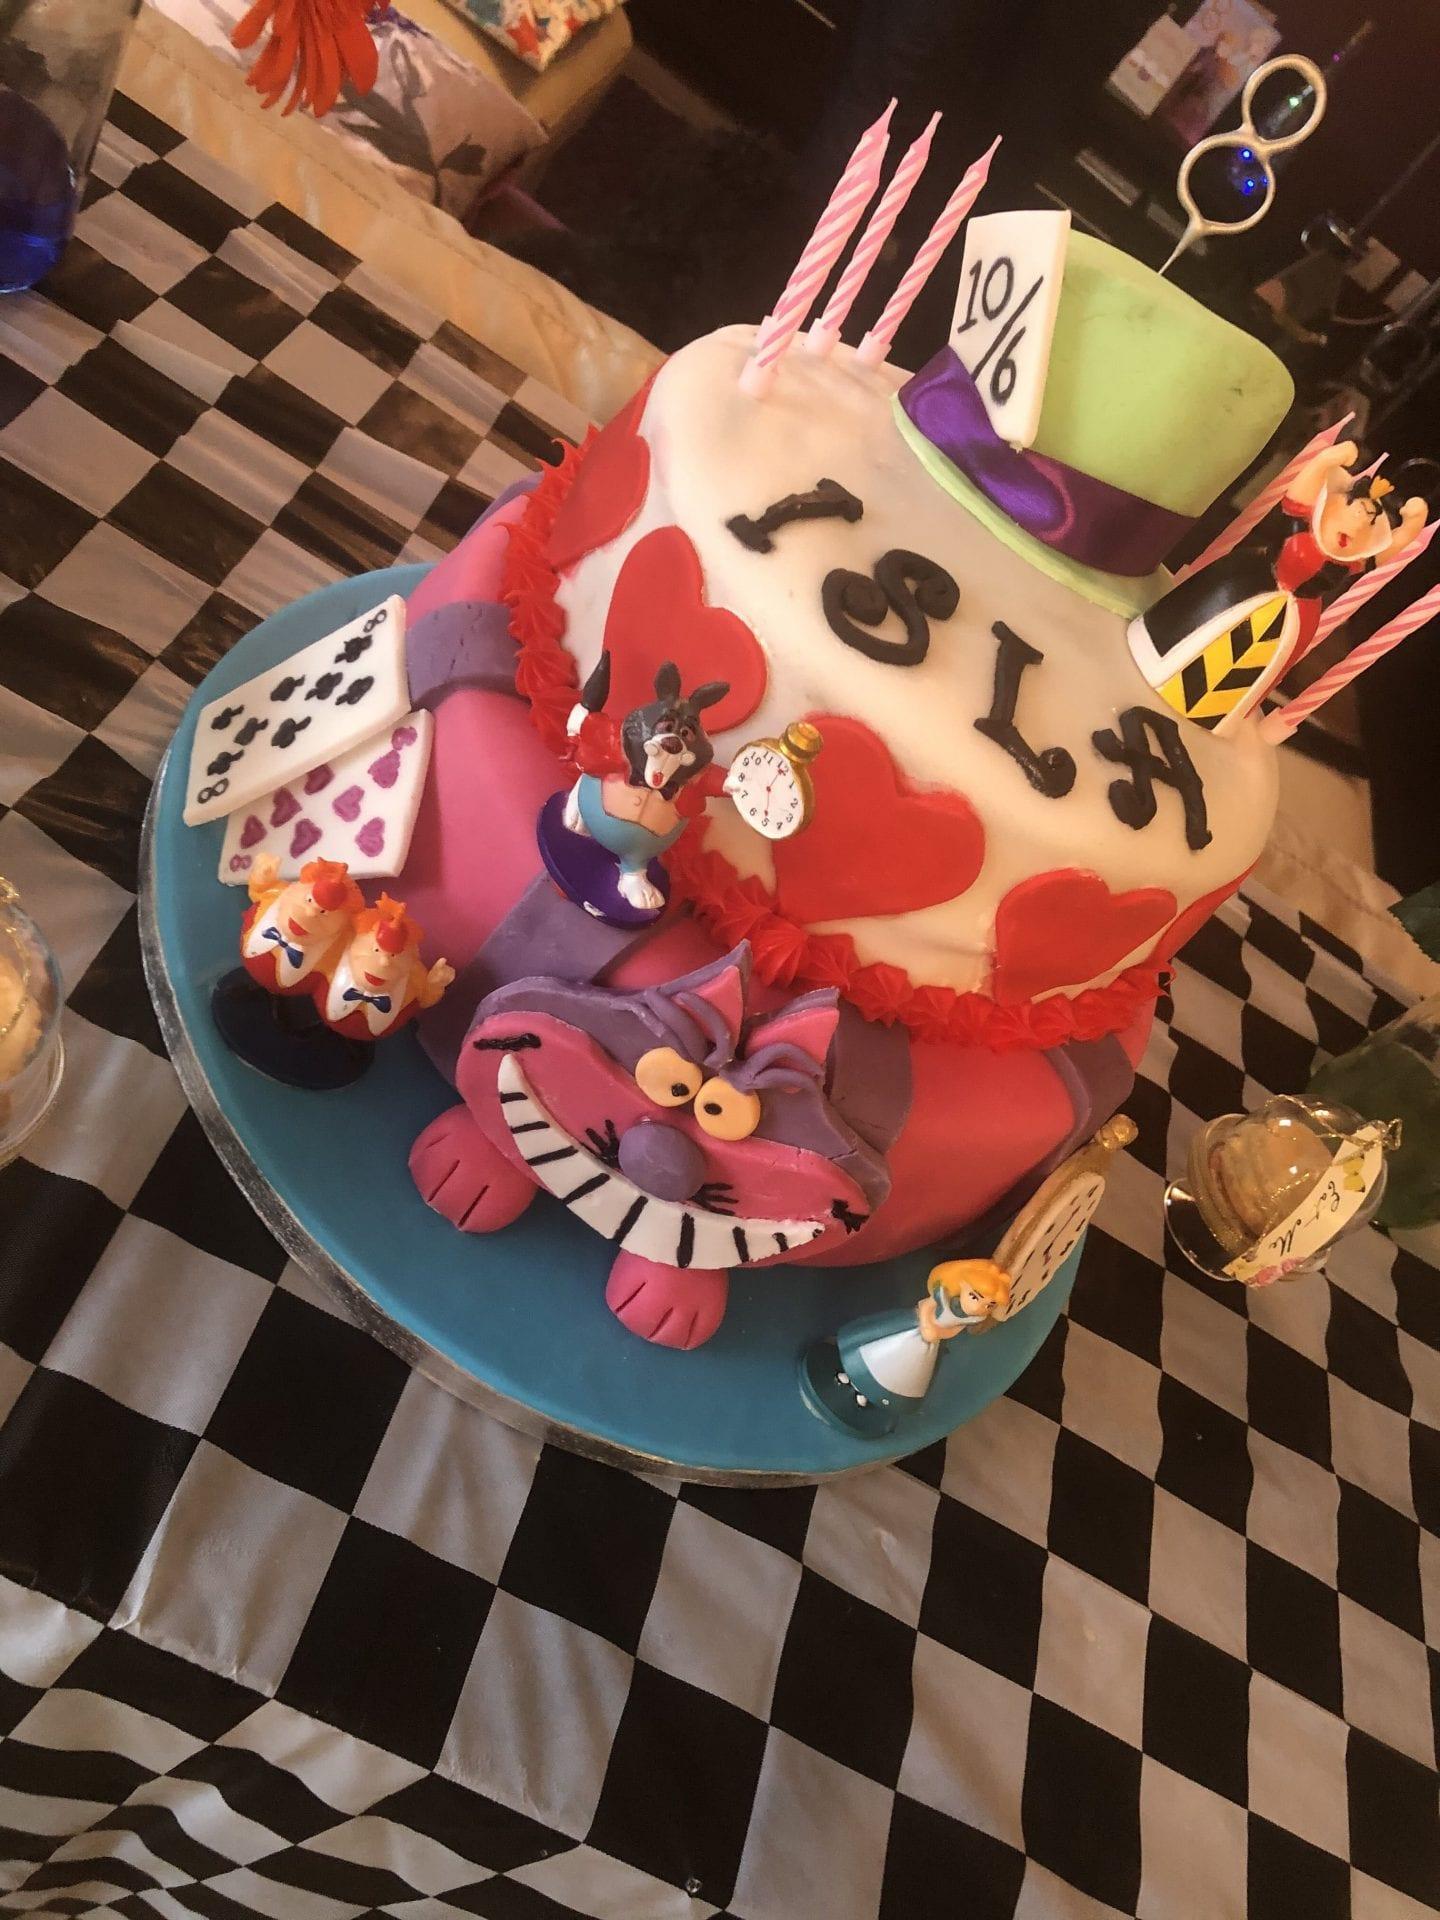 Alsion in Wonderland themed 3 tier birthday cake